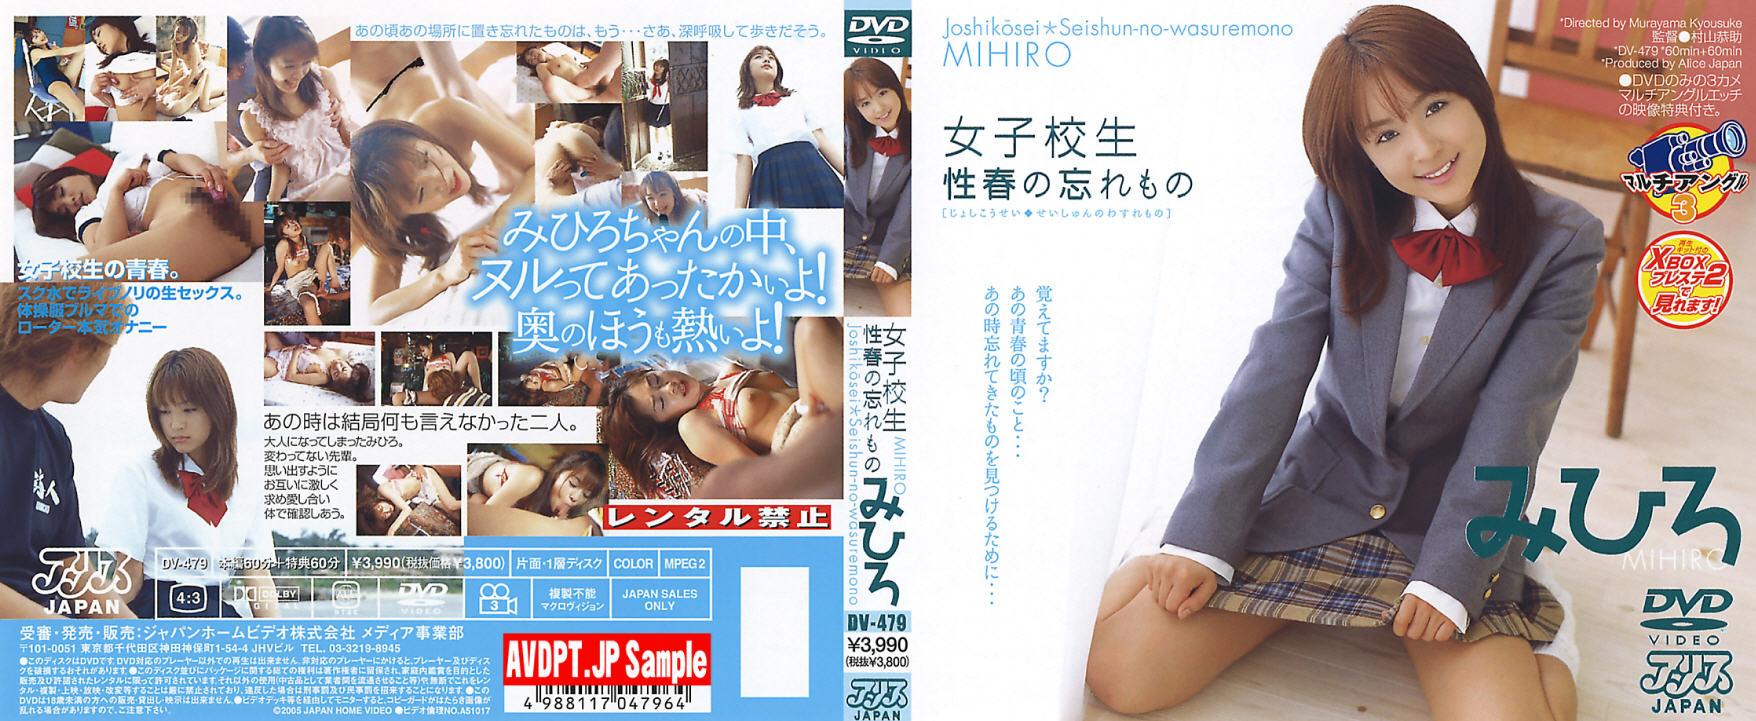 Mihiro Full Nude 33